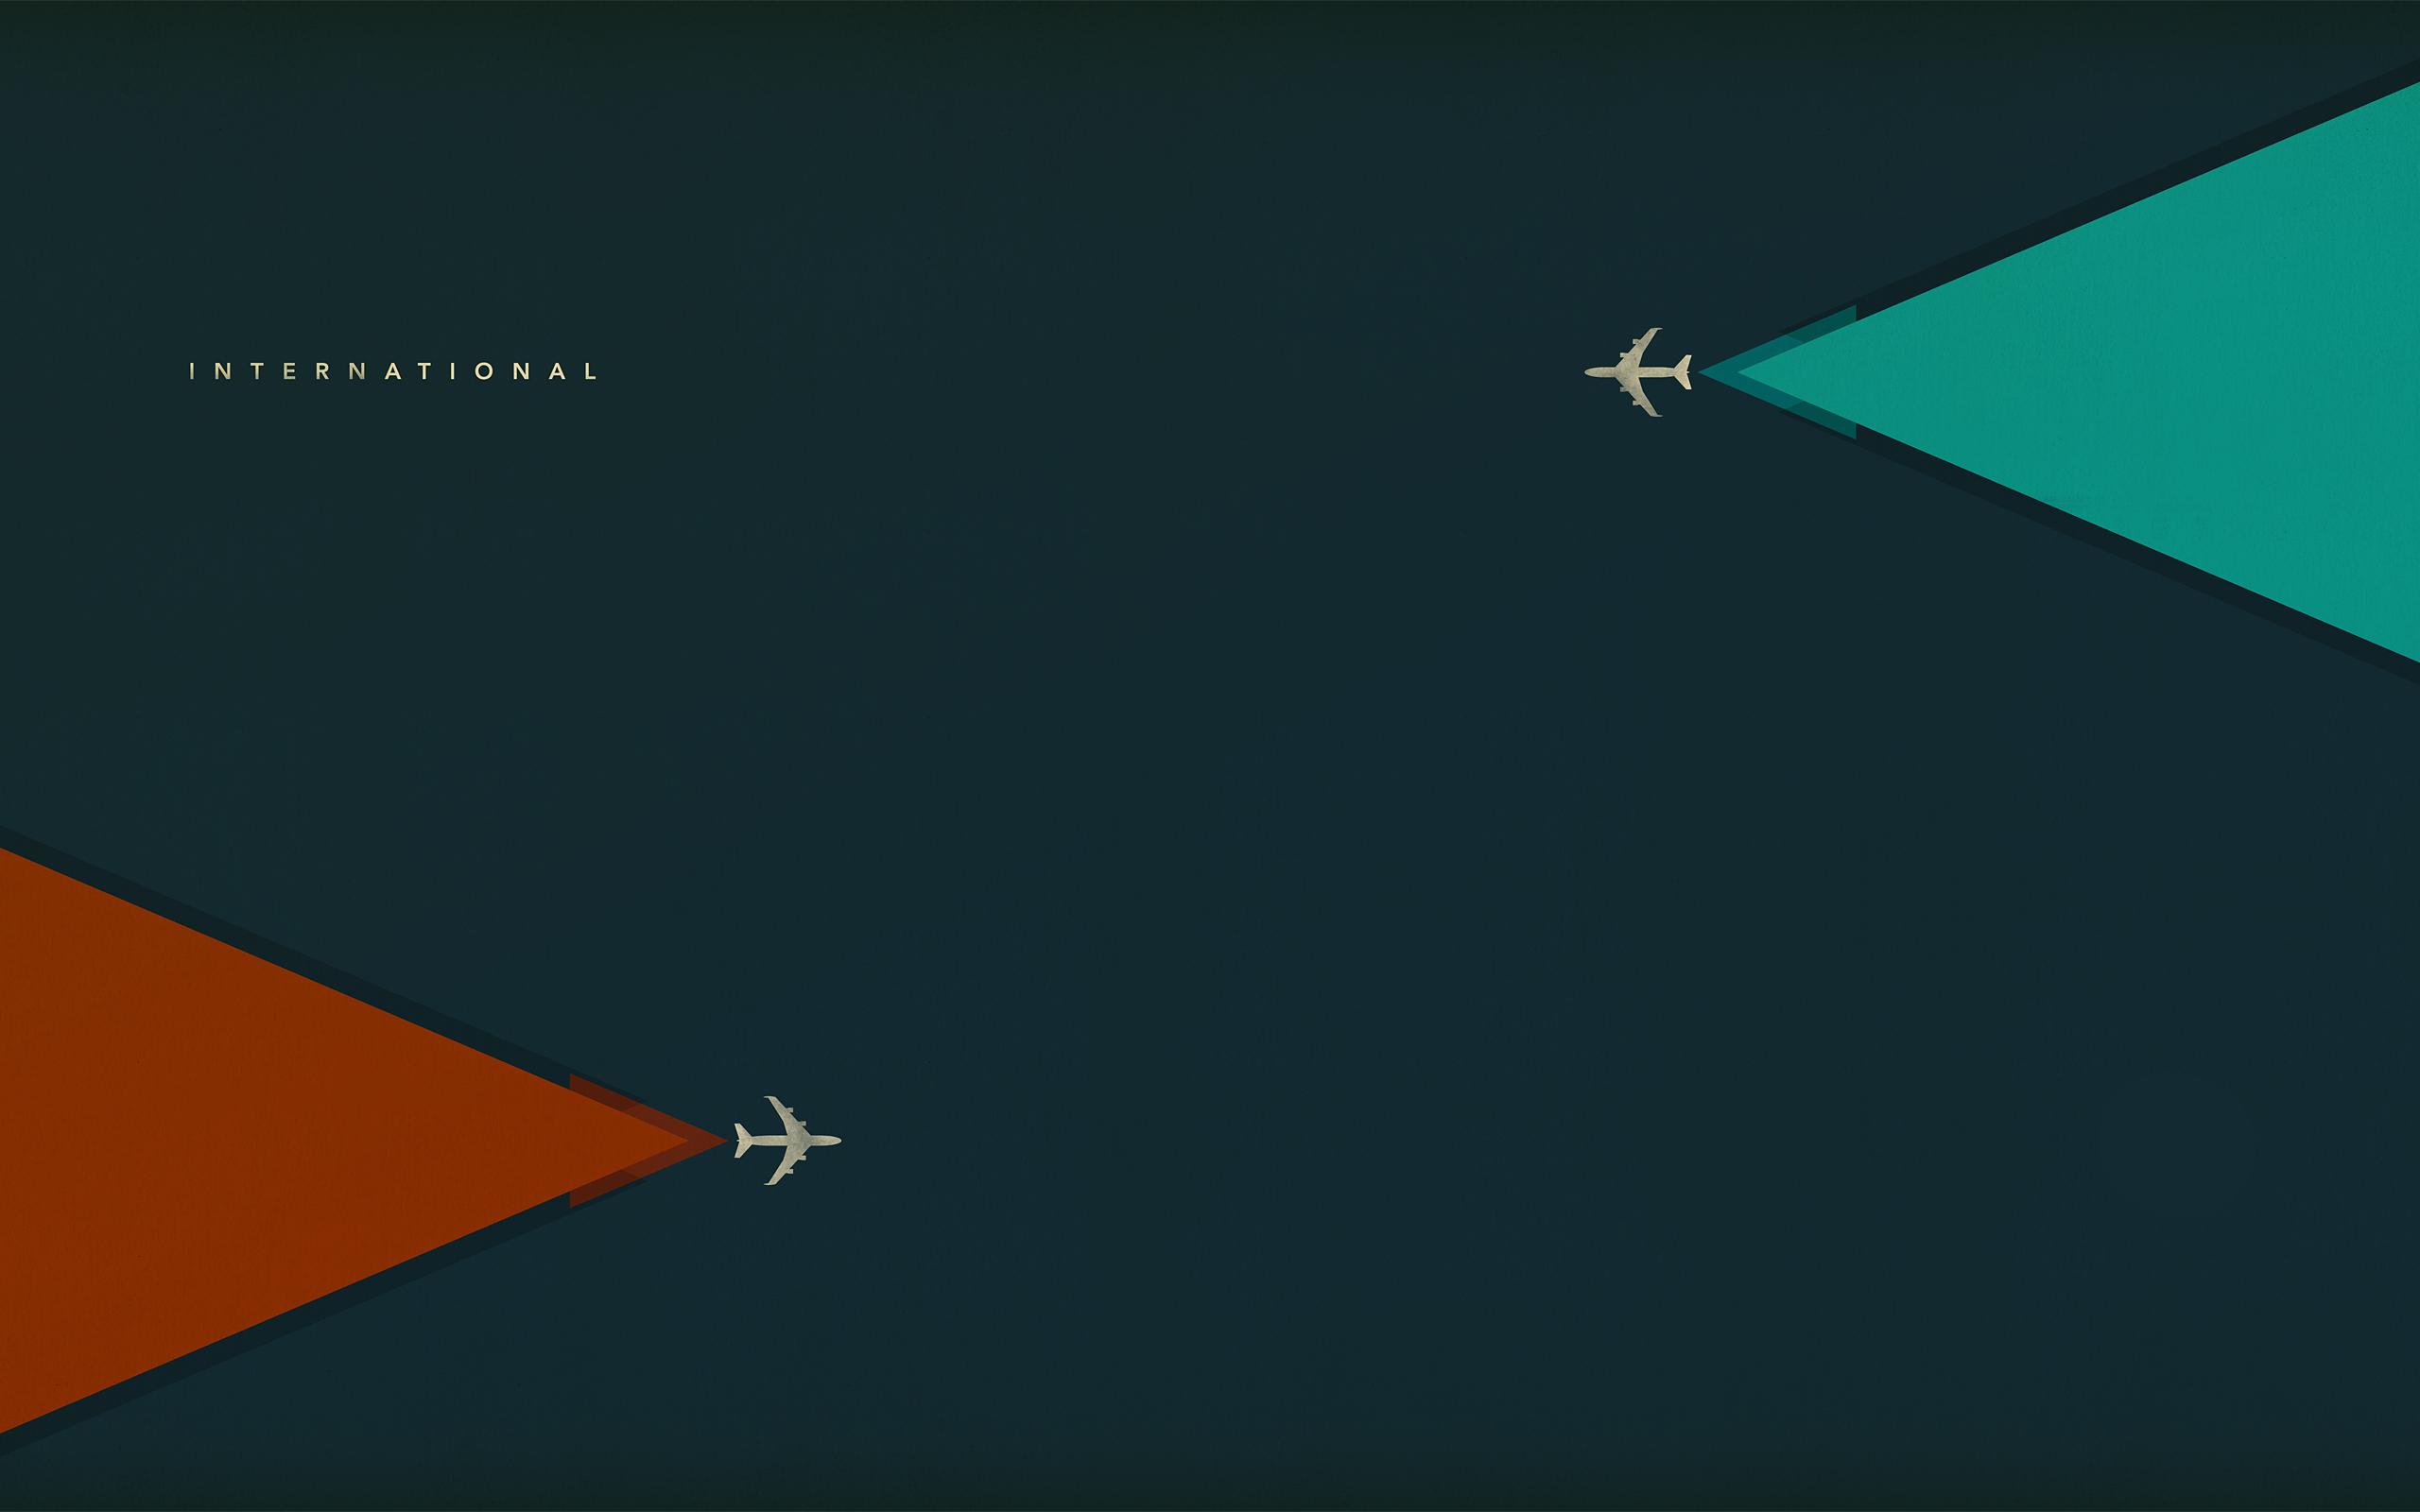 Minimalism airplanes creative airplanes minimalistic wallpaper 2560x1600